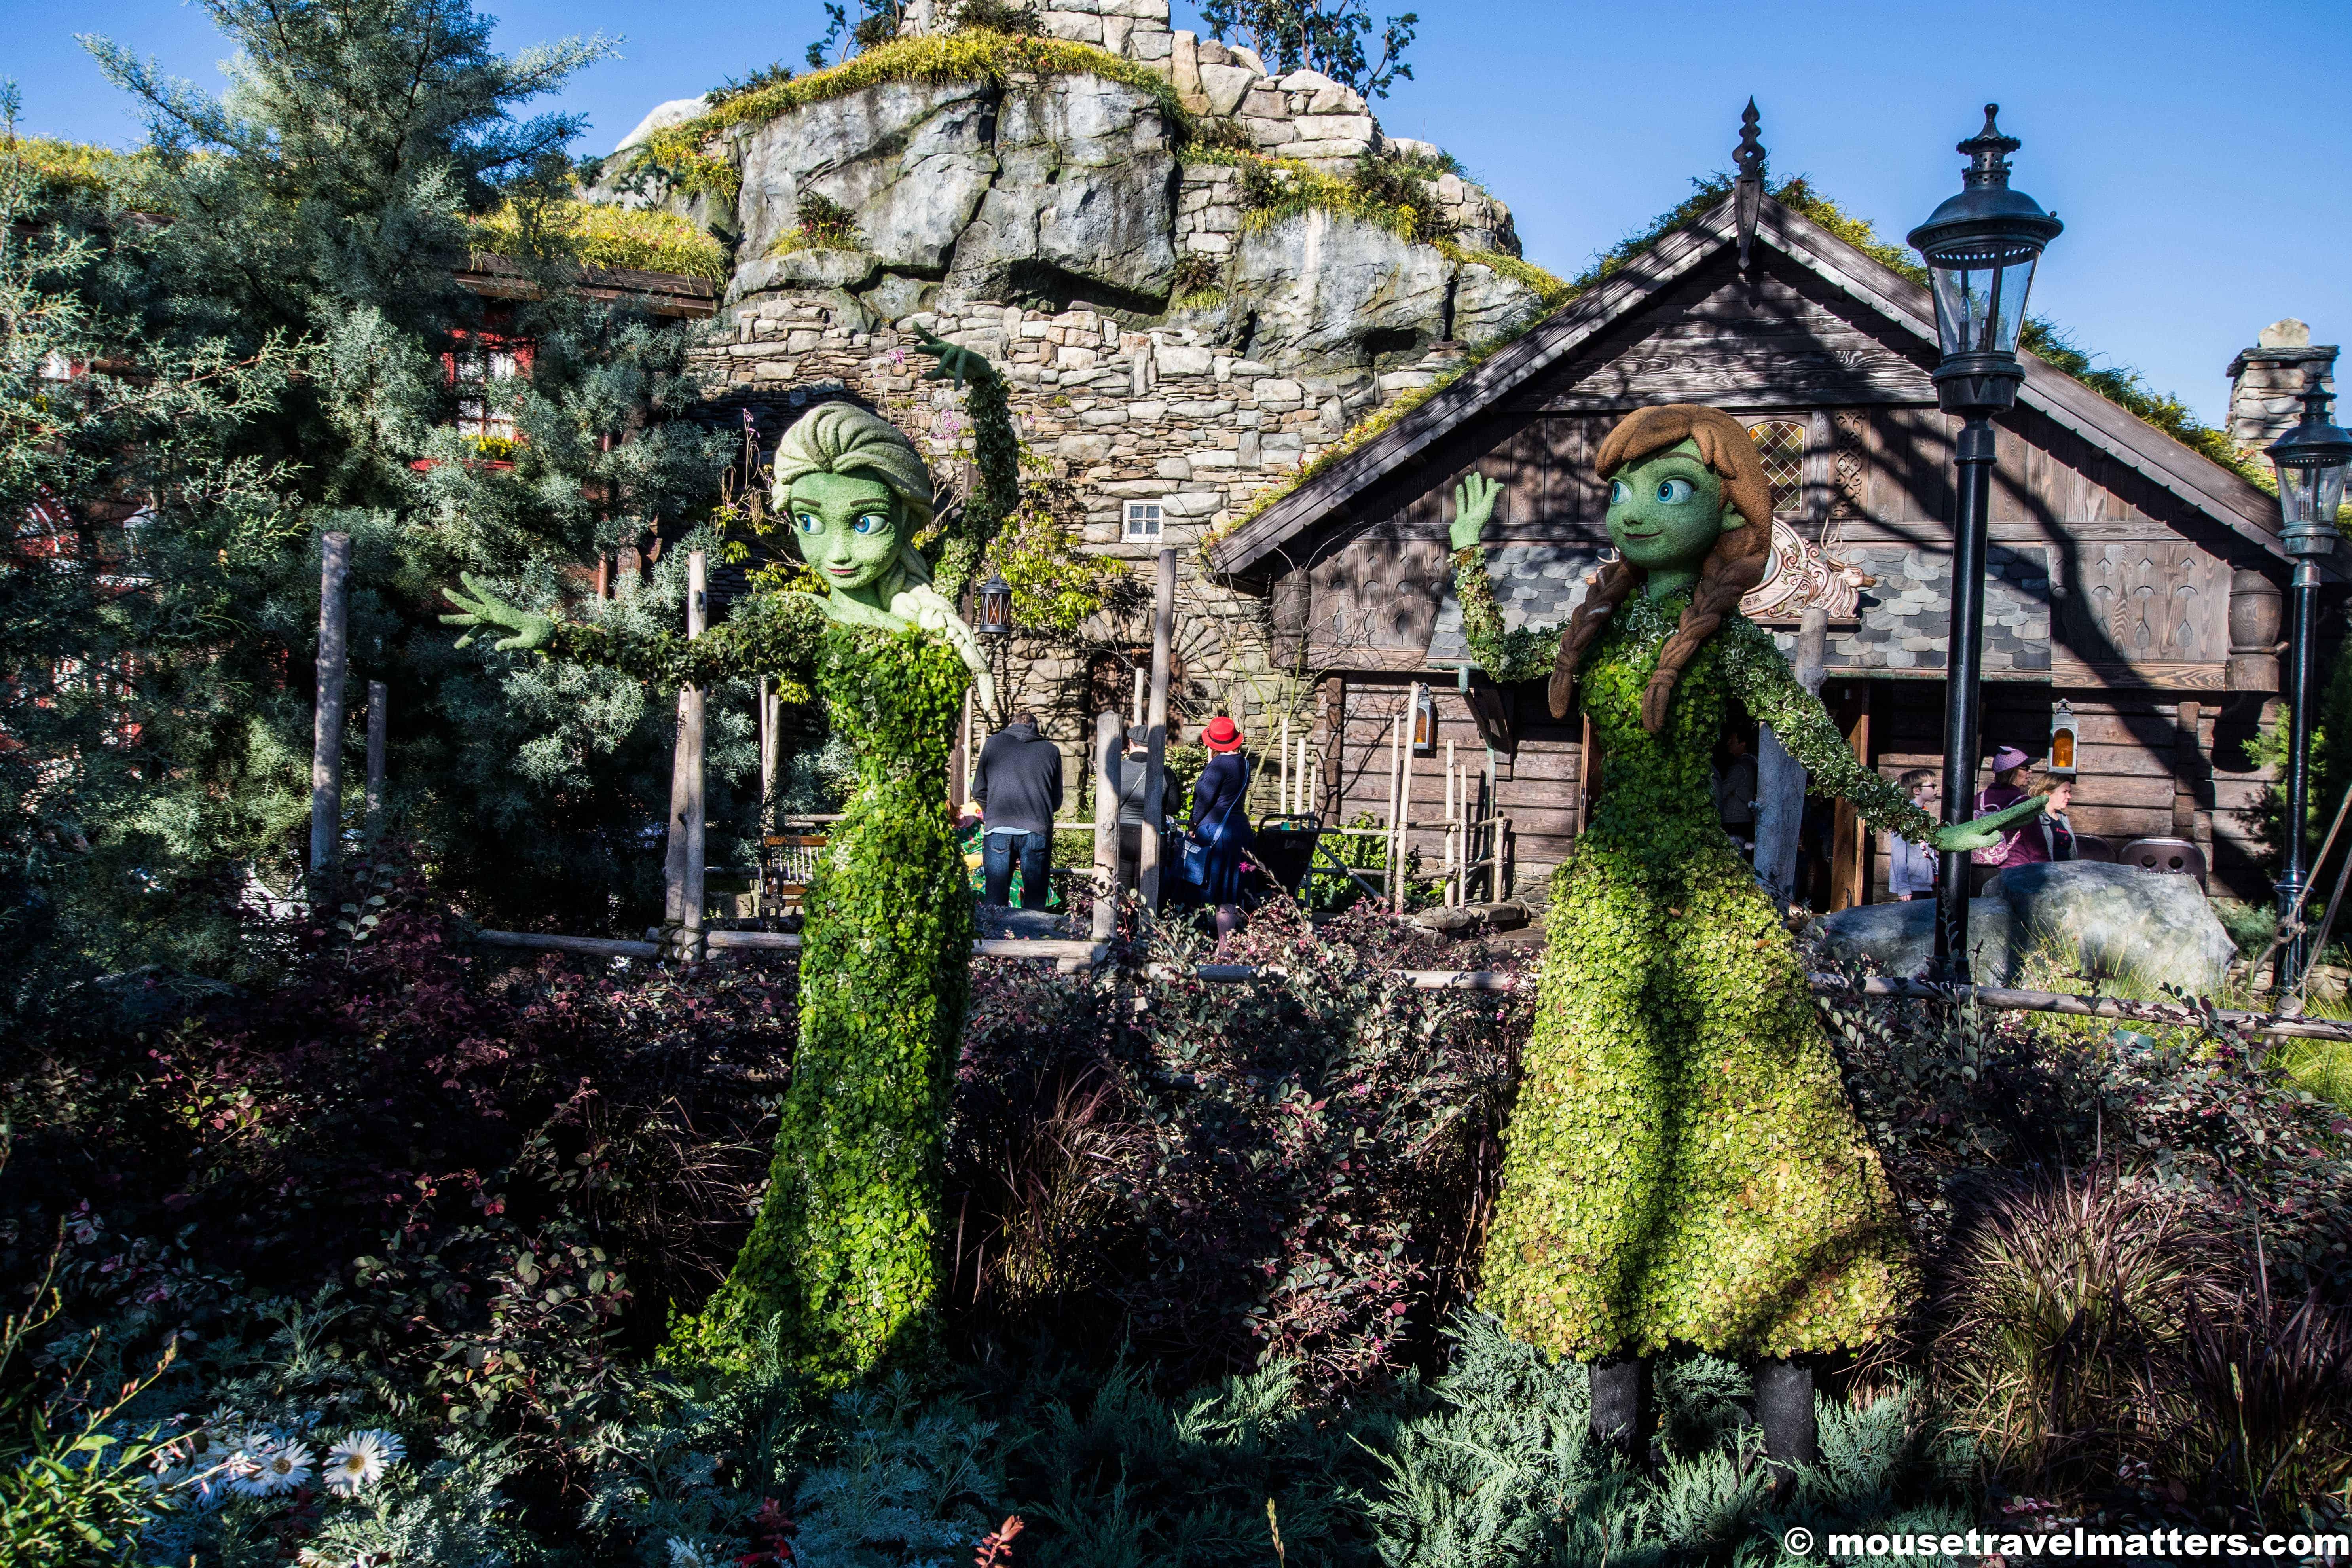 Elsa & Anna Topiary Norway Pavilion